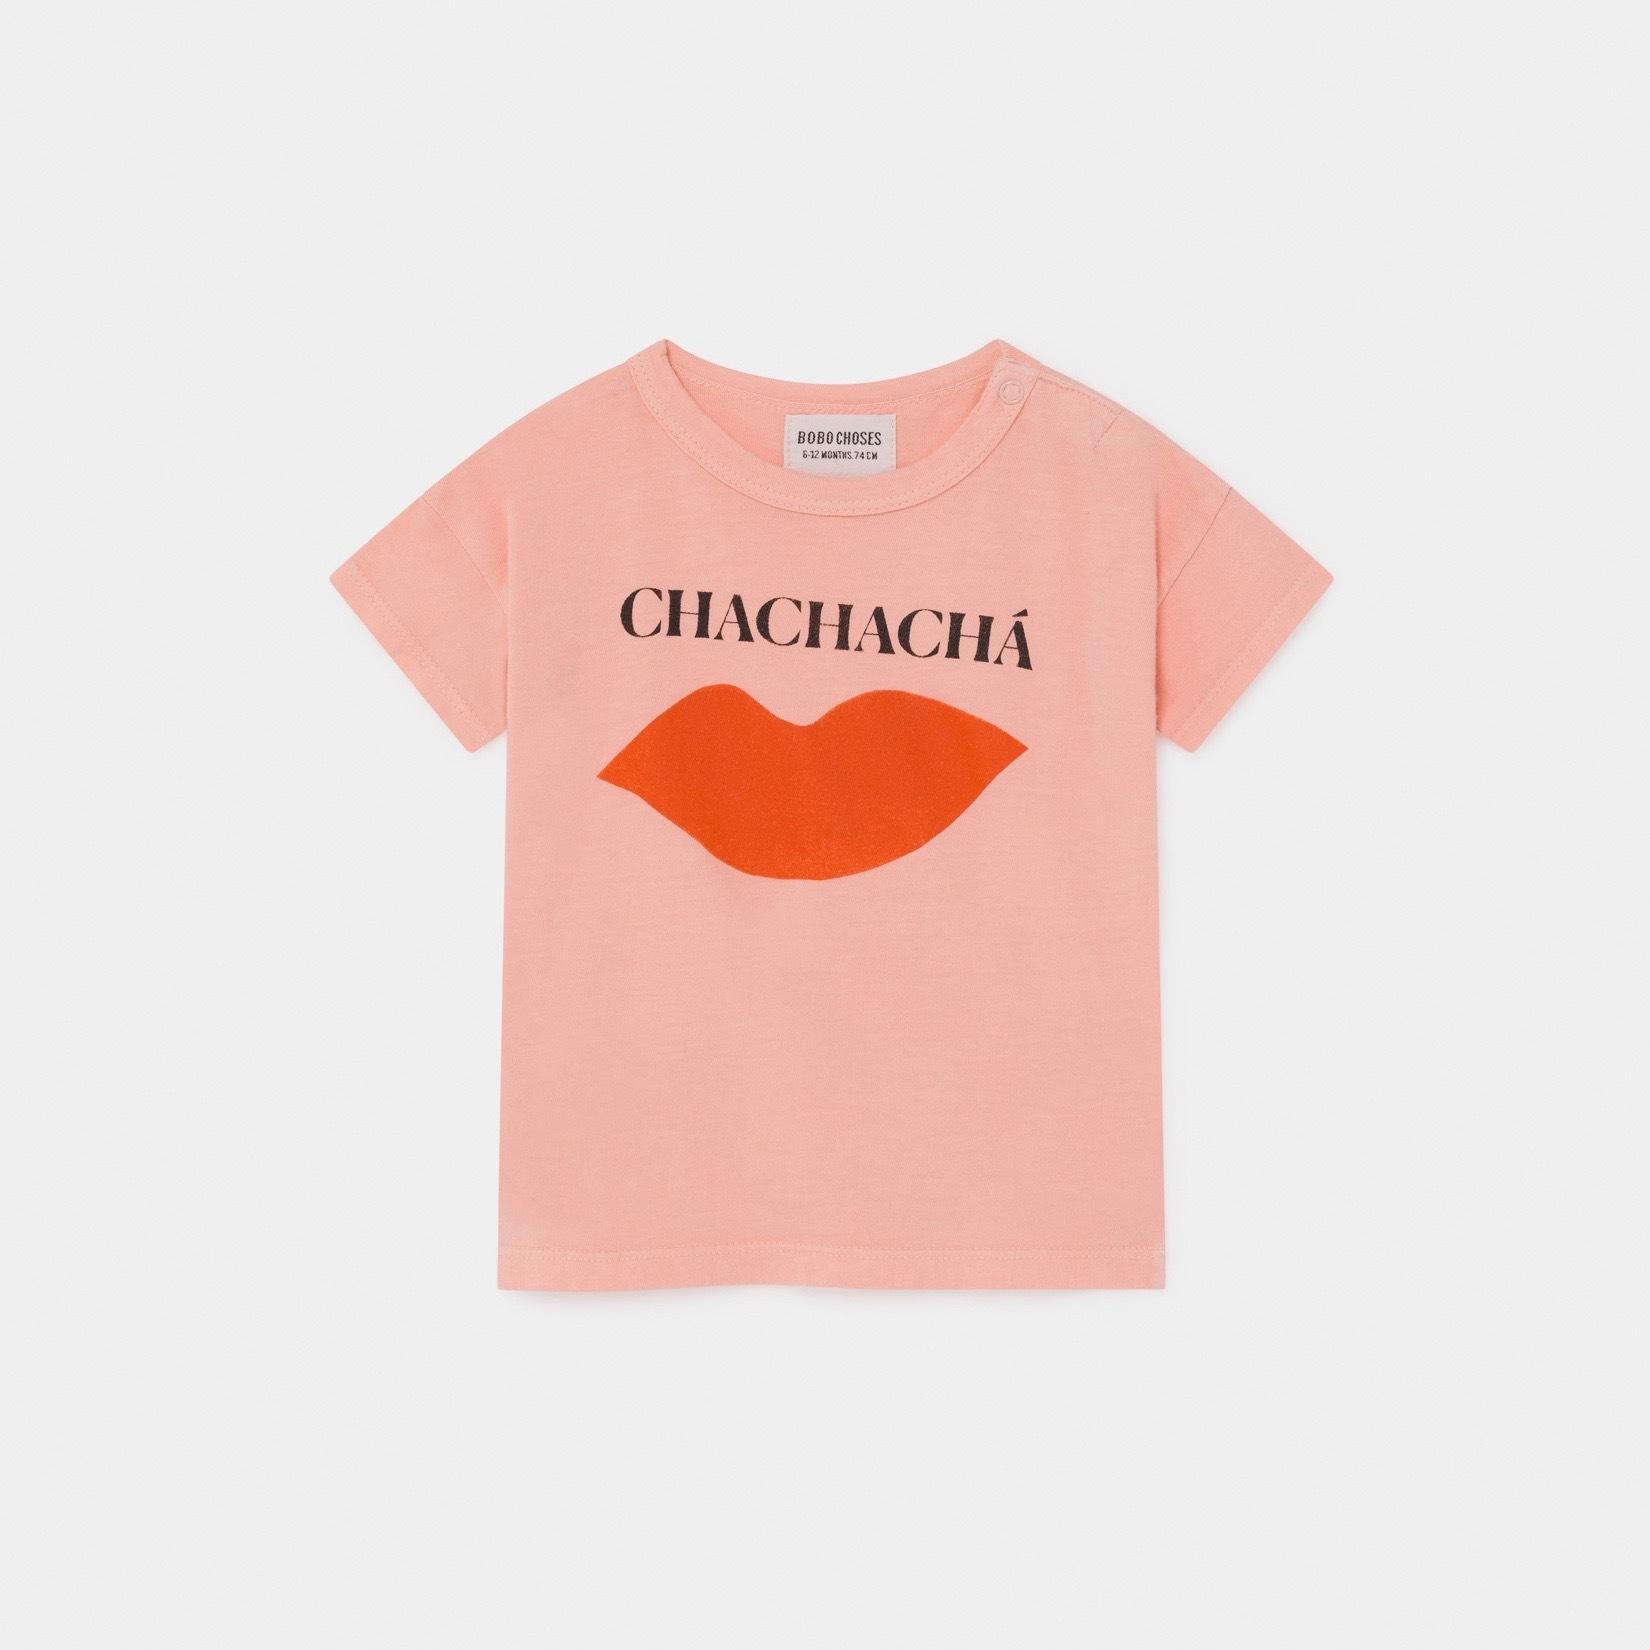 《BOBO CHOSES 2020SS》Chachacha Kiss T-Shirt / 6-36M